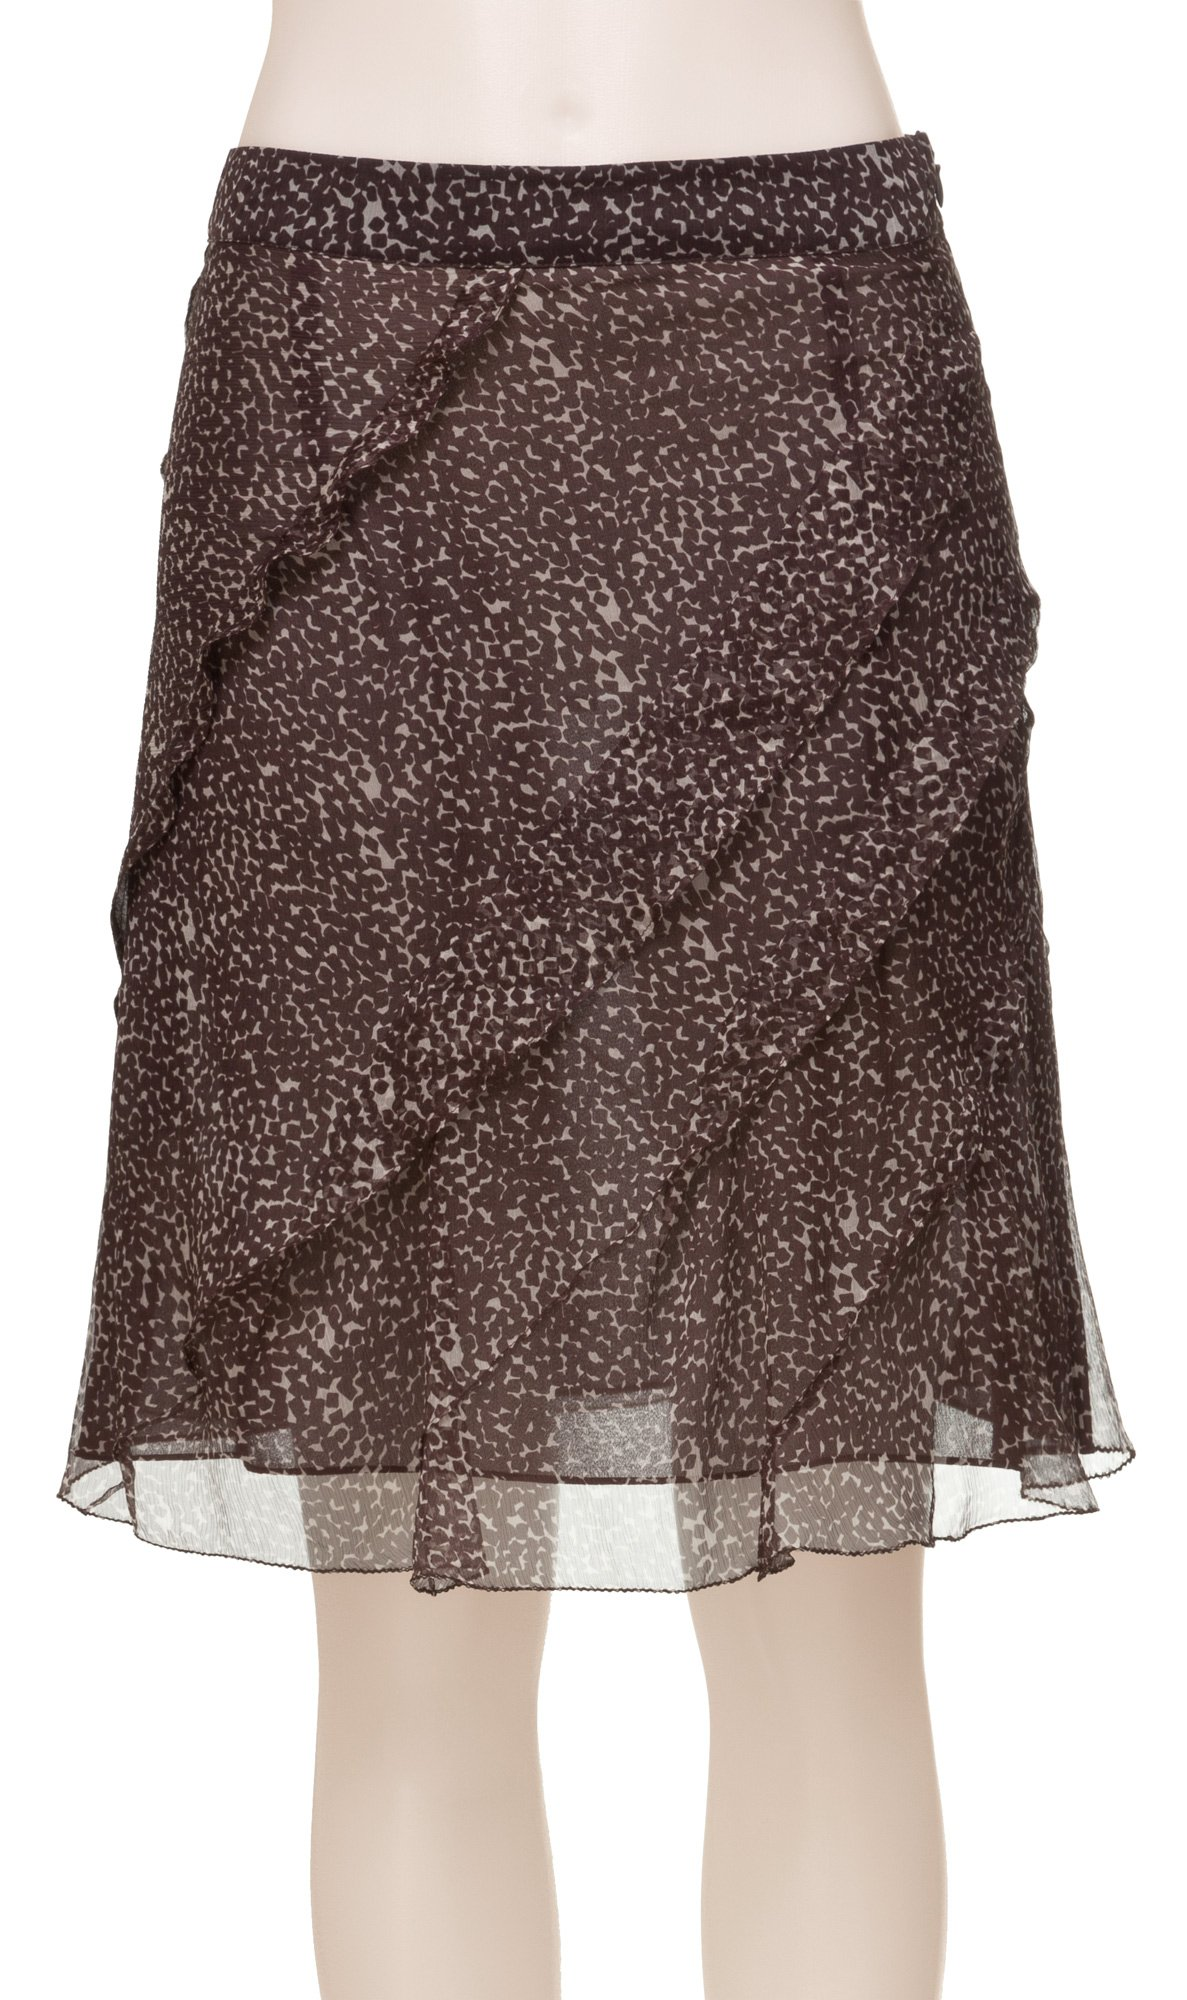 MAXSTUDIO Silk Chiffon Skirt - 2108Y12-DKBRNKBL-6